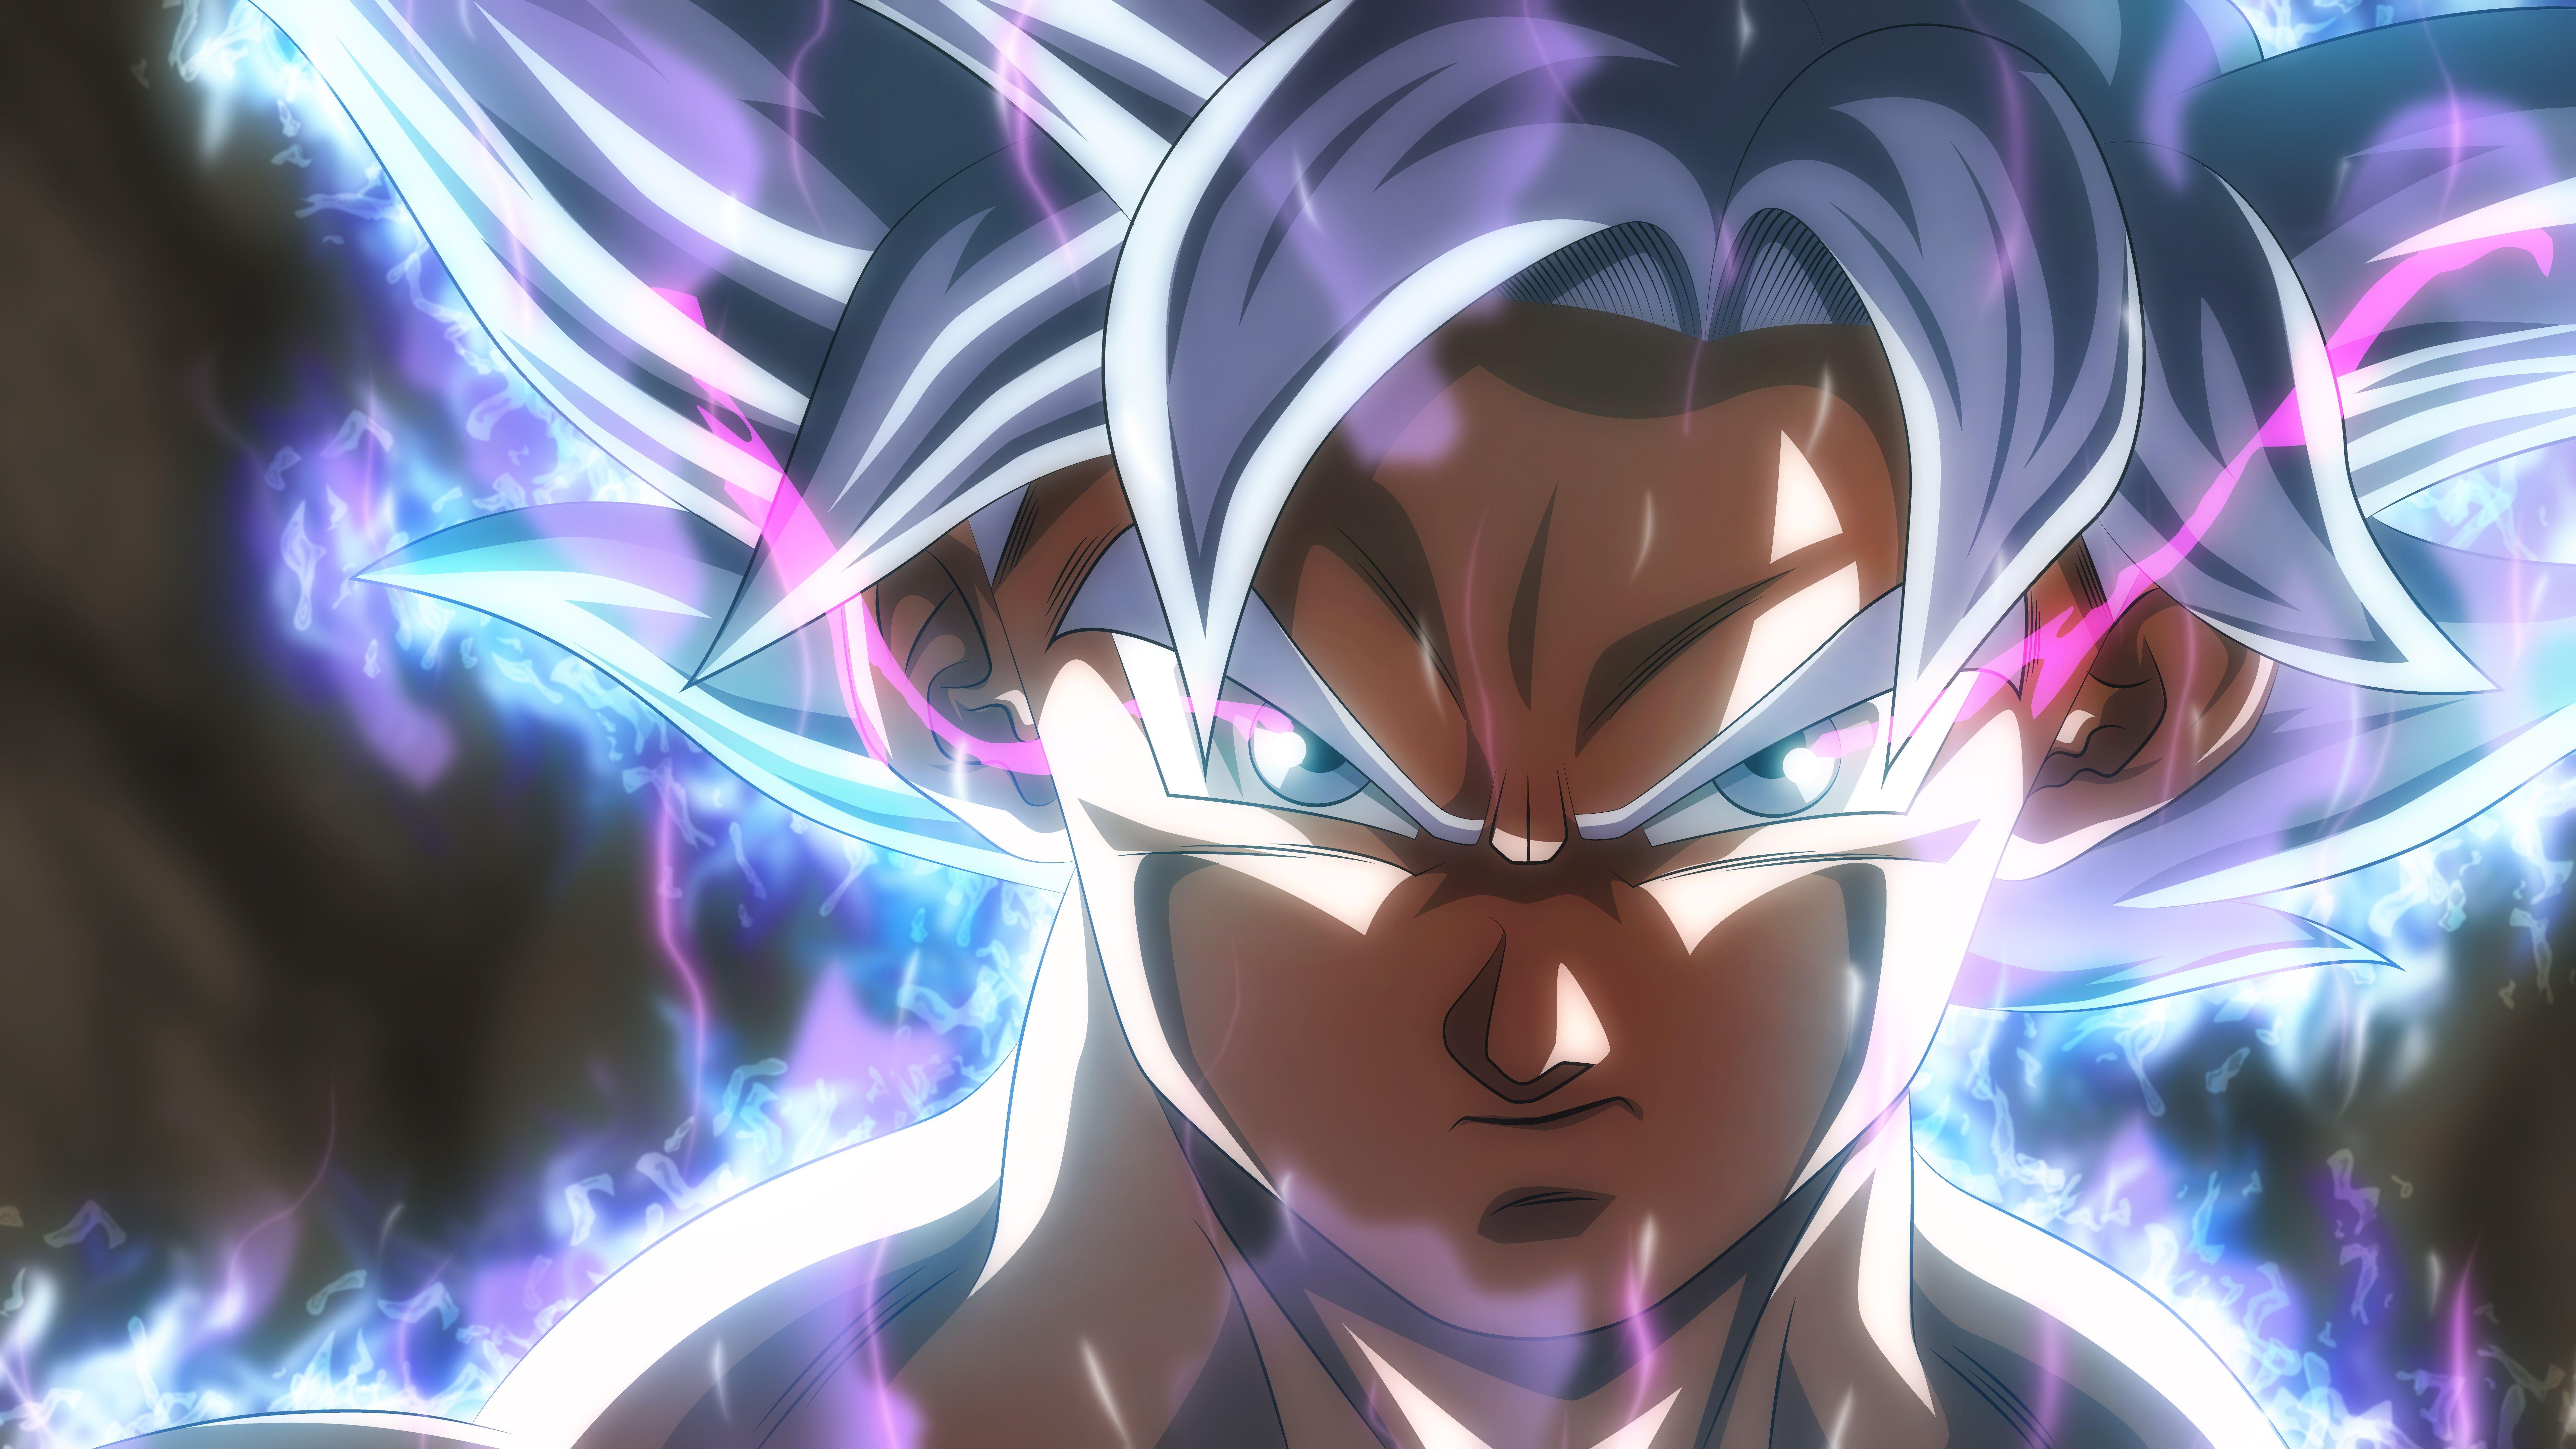 Goku Ultra Instinct 4k 8k Goku Wallpaper Dragon Ball Wallpapers Dragon Ball Super Wallpapers